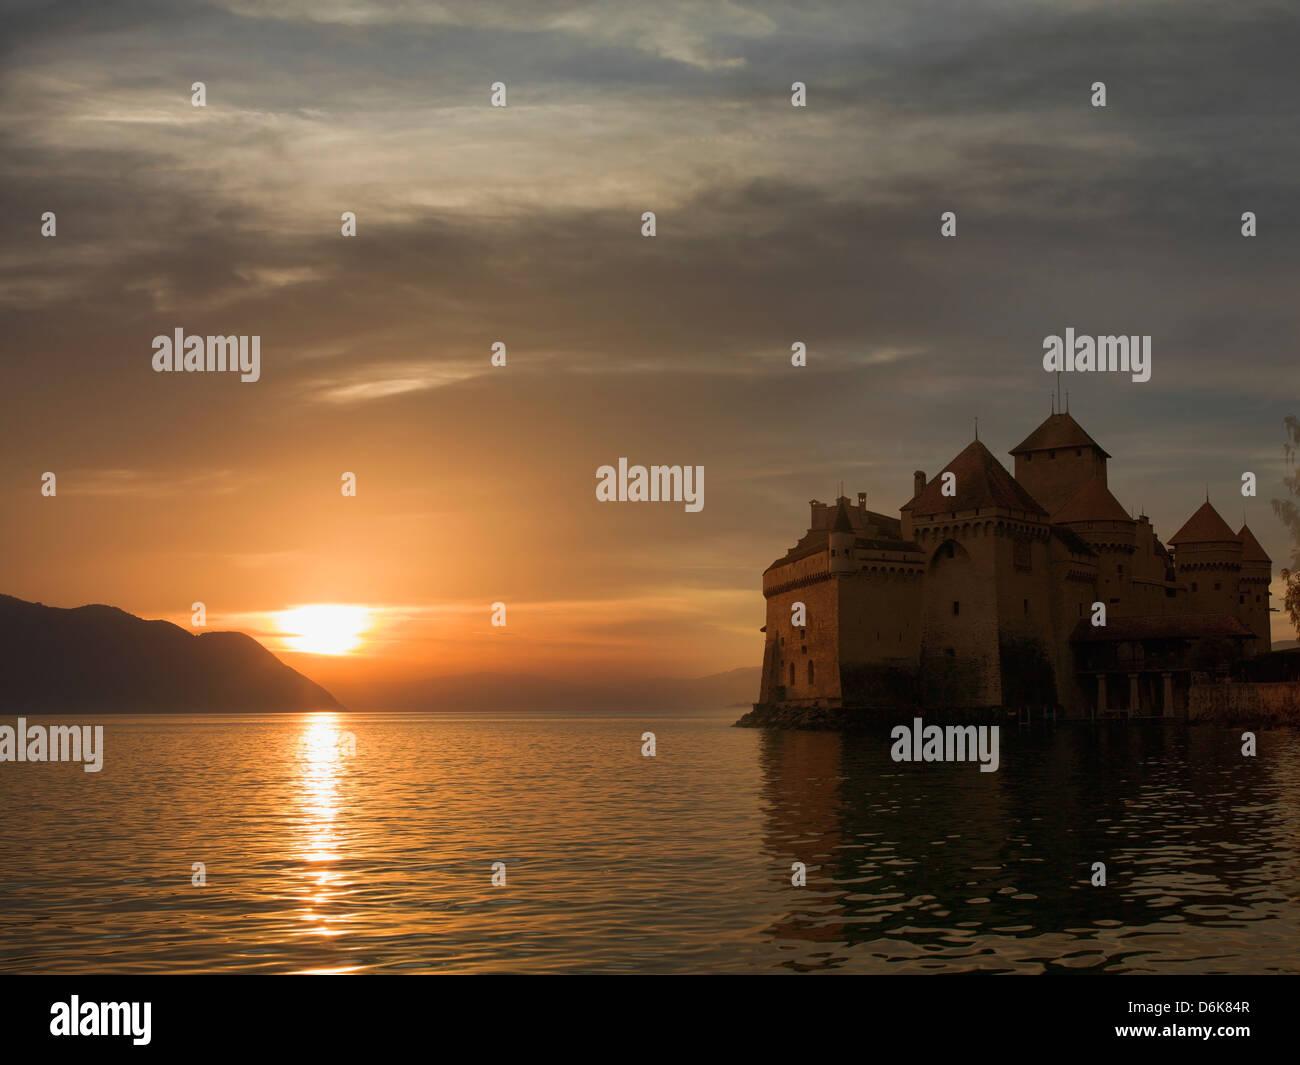 The Castle of Chillon, on Lake Geneva at sunset, Montreux, Canton Vaud, Switzerland, Europe - Stock Image